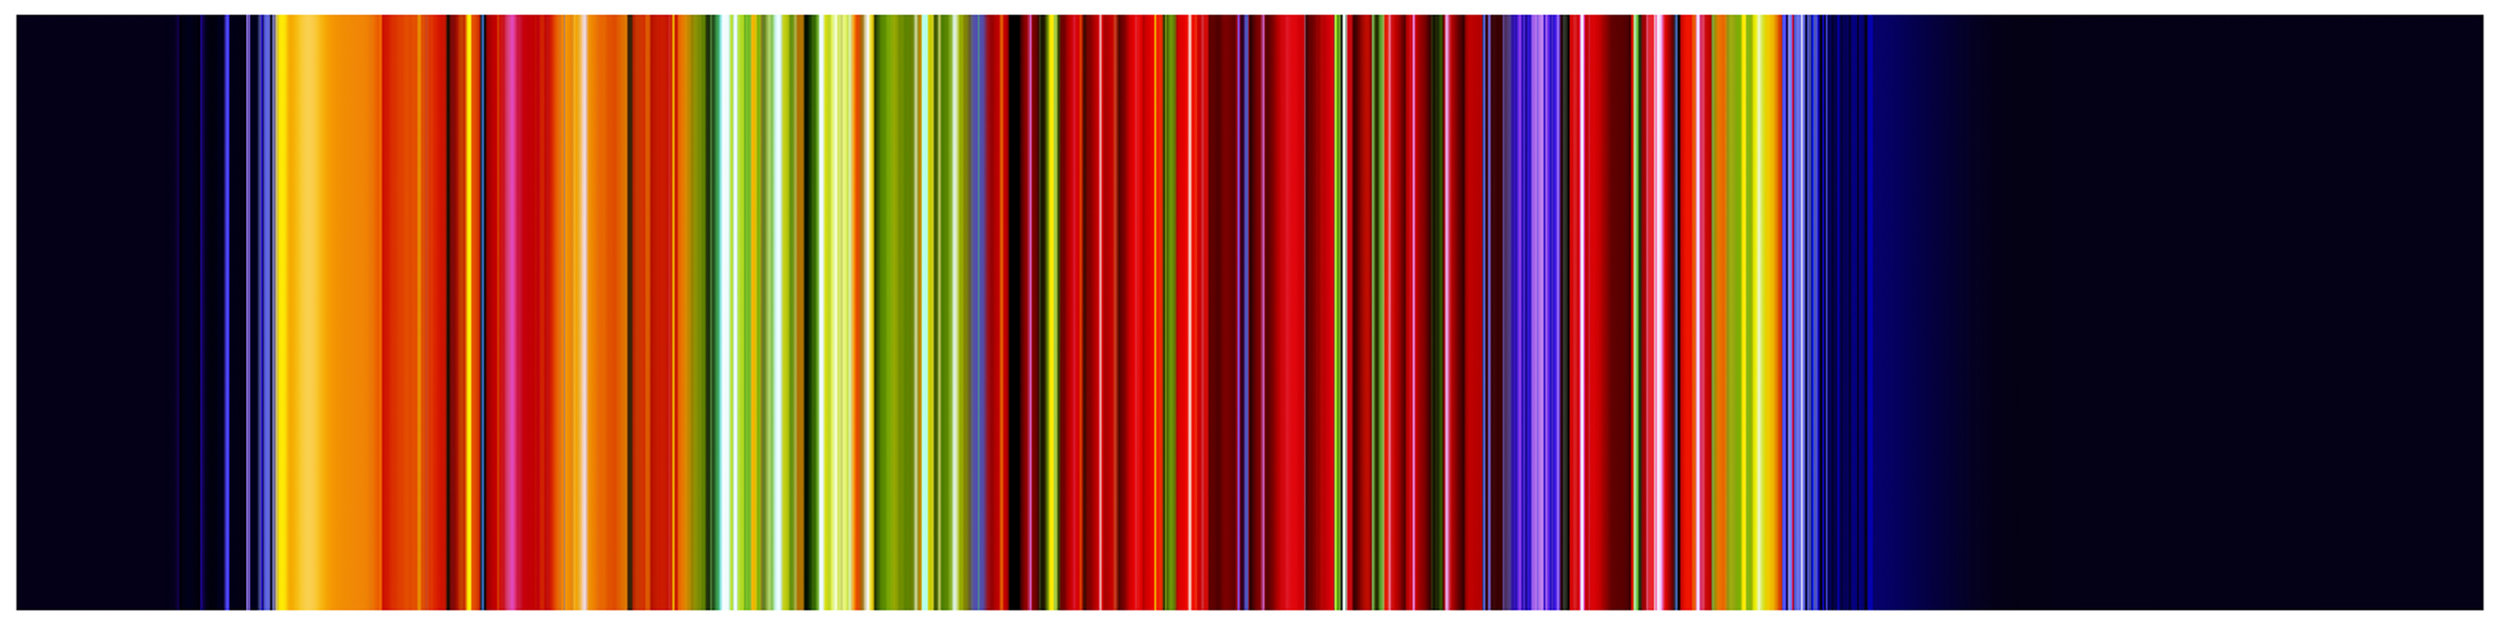 PAUL SNELL  NY # 40.57N_73.96W 2014 Lambda Print, face-mounted to 4.5mm plexiglas 75 × 300 cm